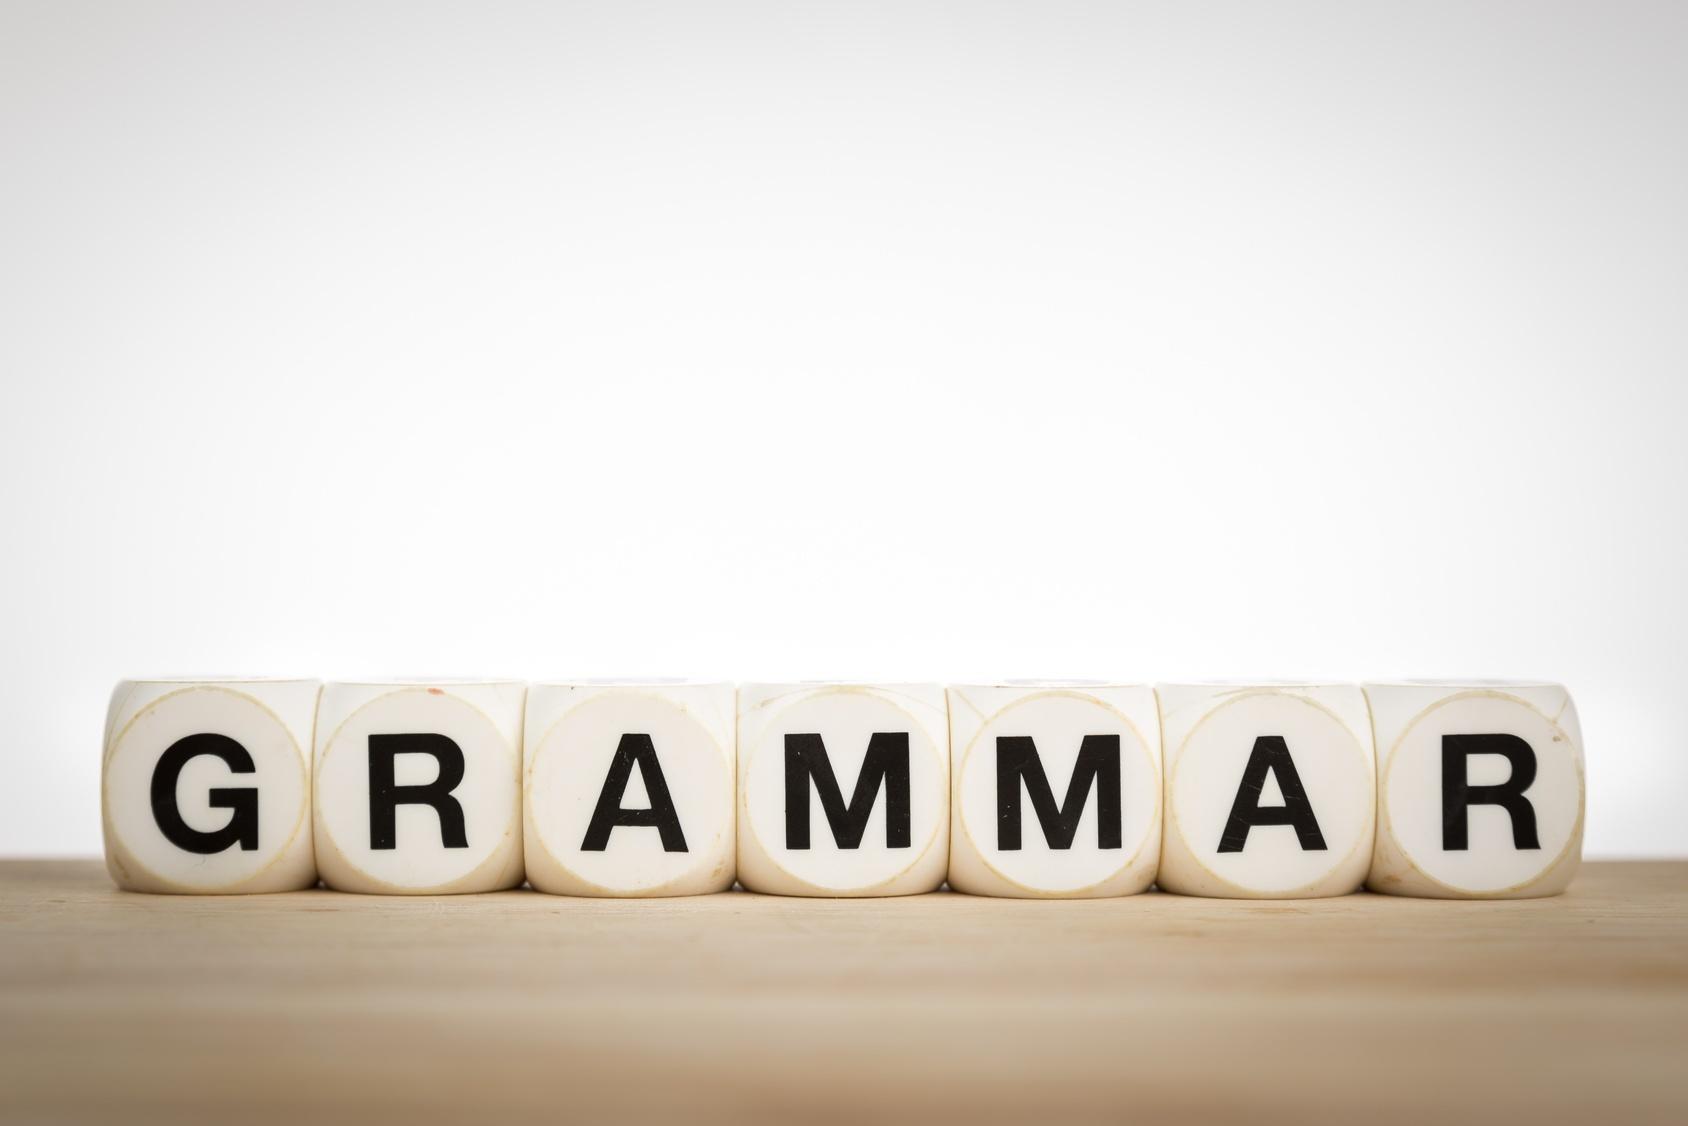 grammar-1.jpg